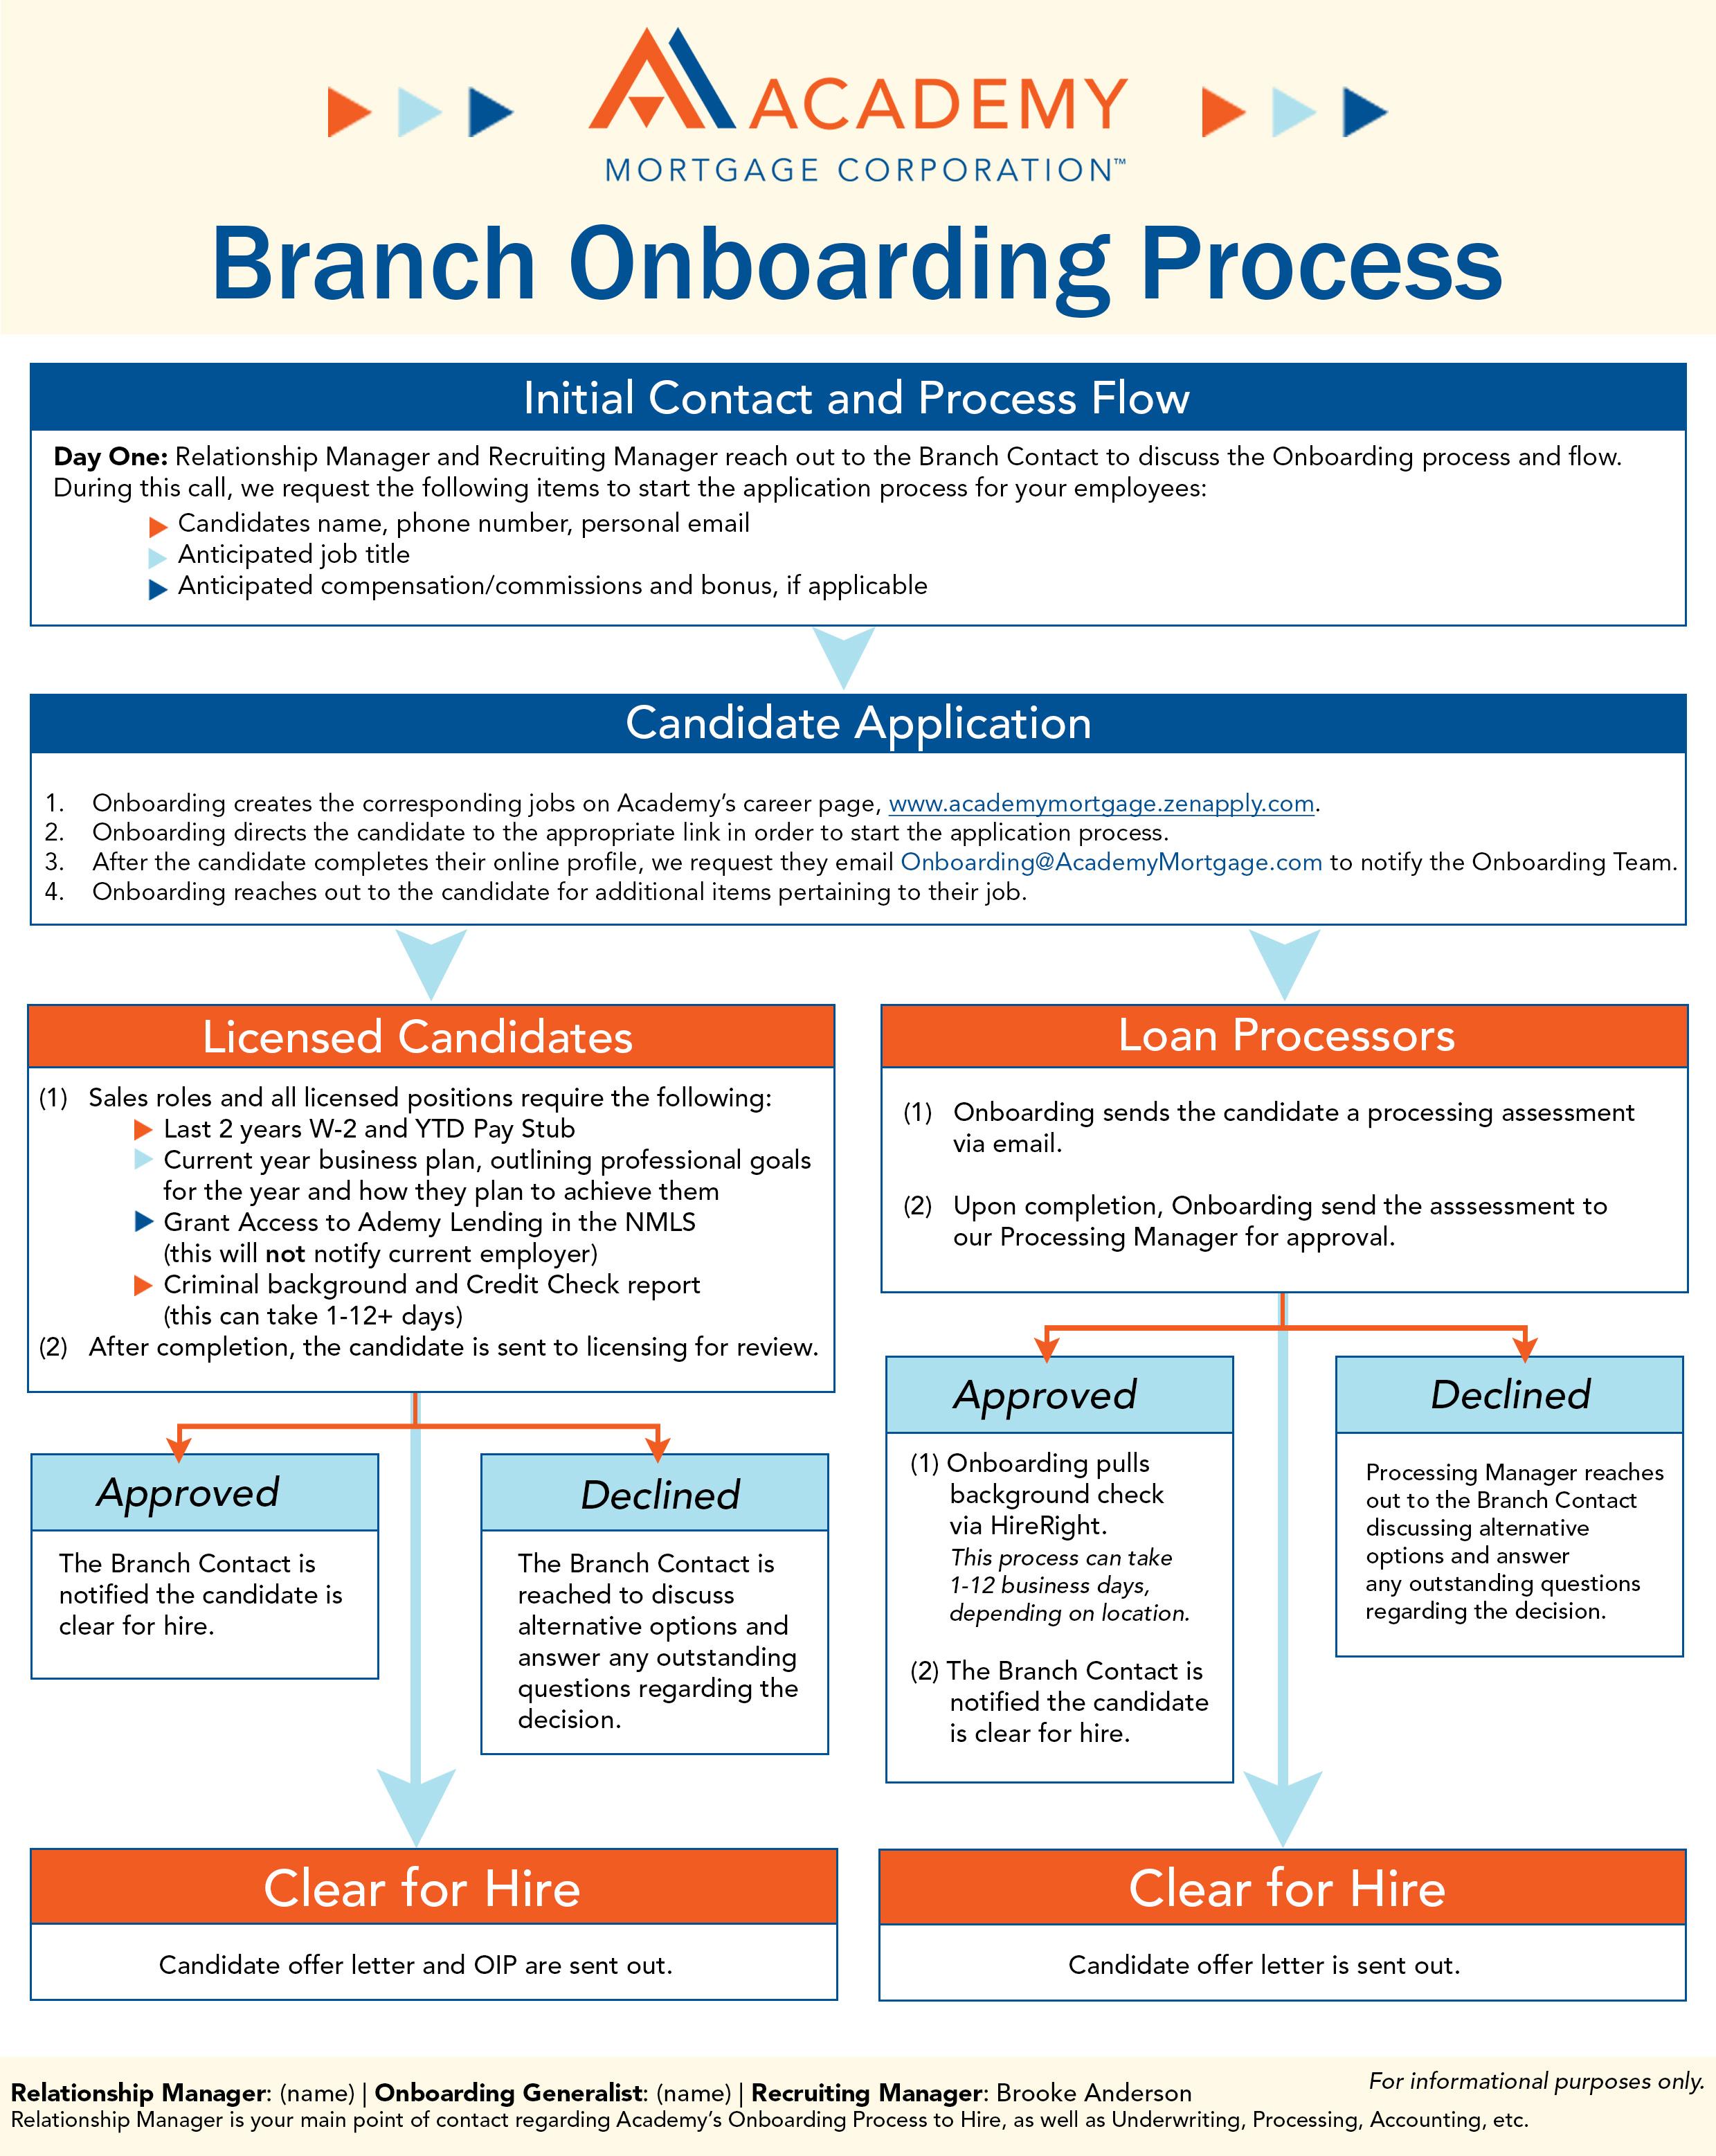 Branch Onboarding Flow Chart (1)